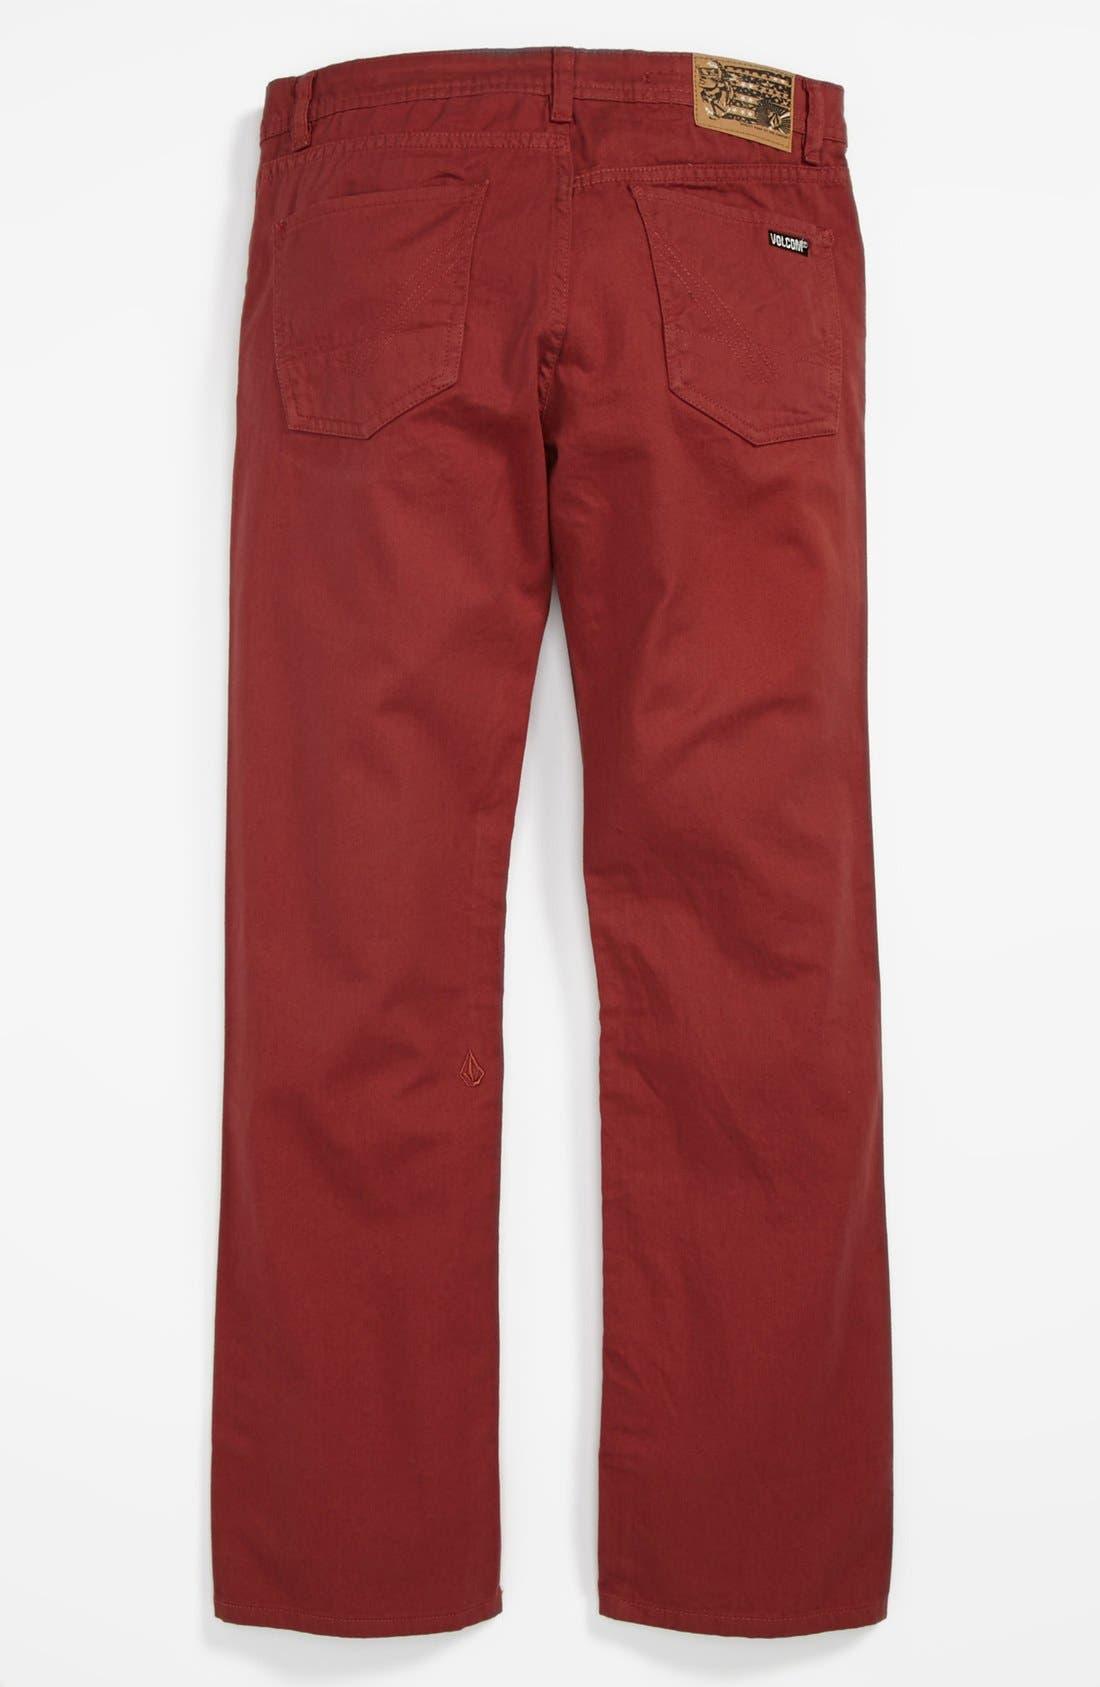 Main Image - Volcom 'Vorta' Twill Pants (Little Boys)